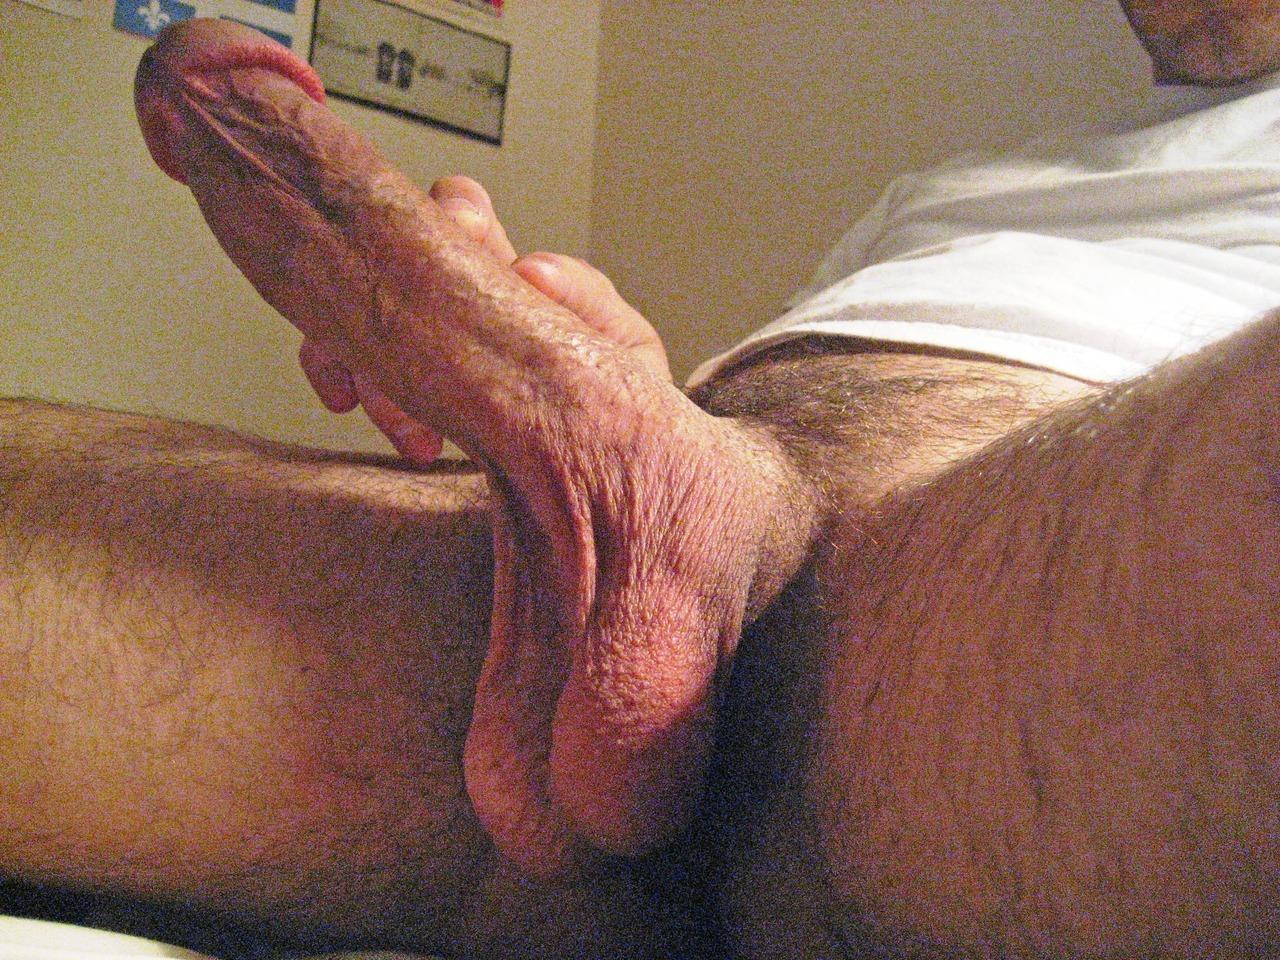 Huge penis solo